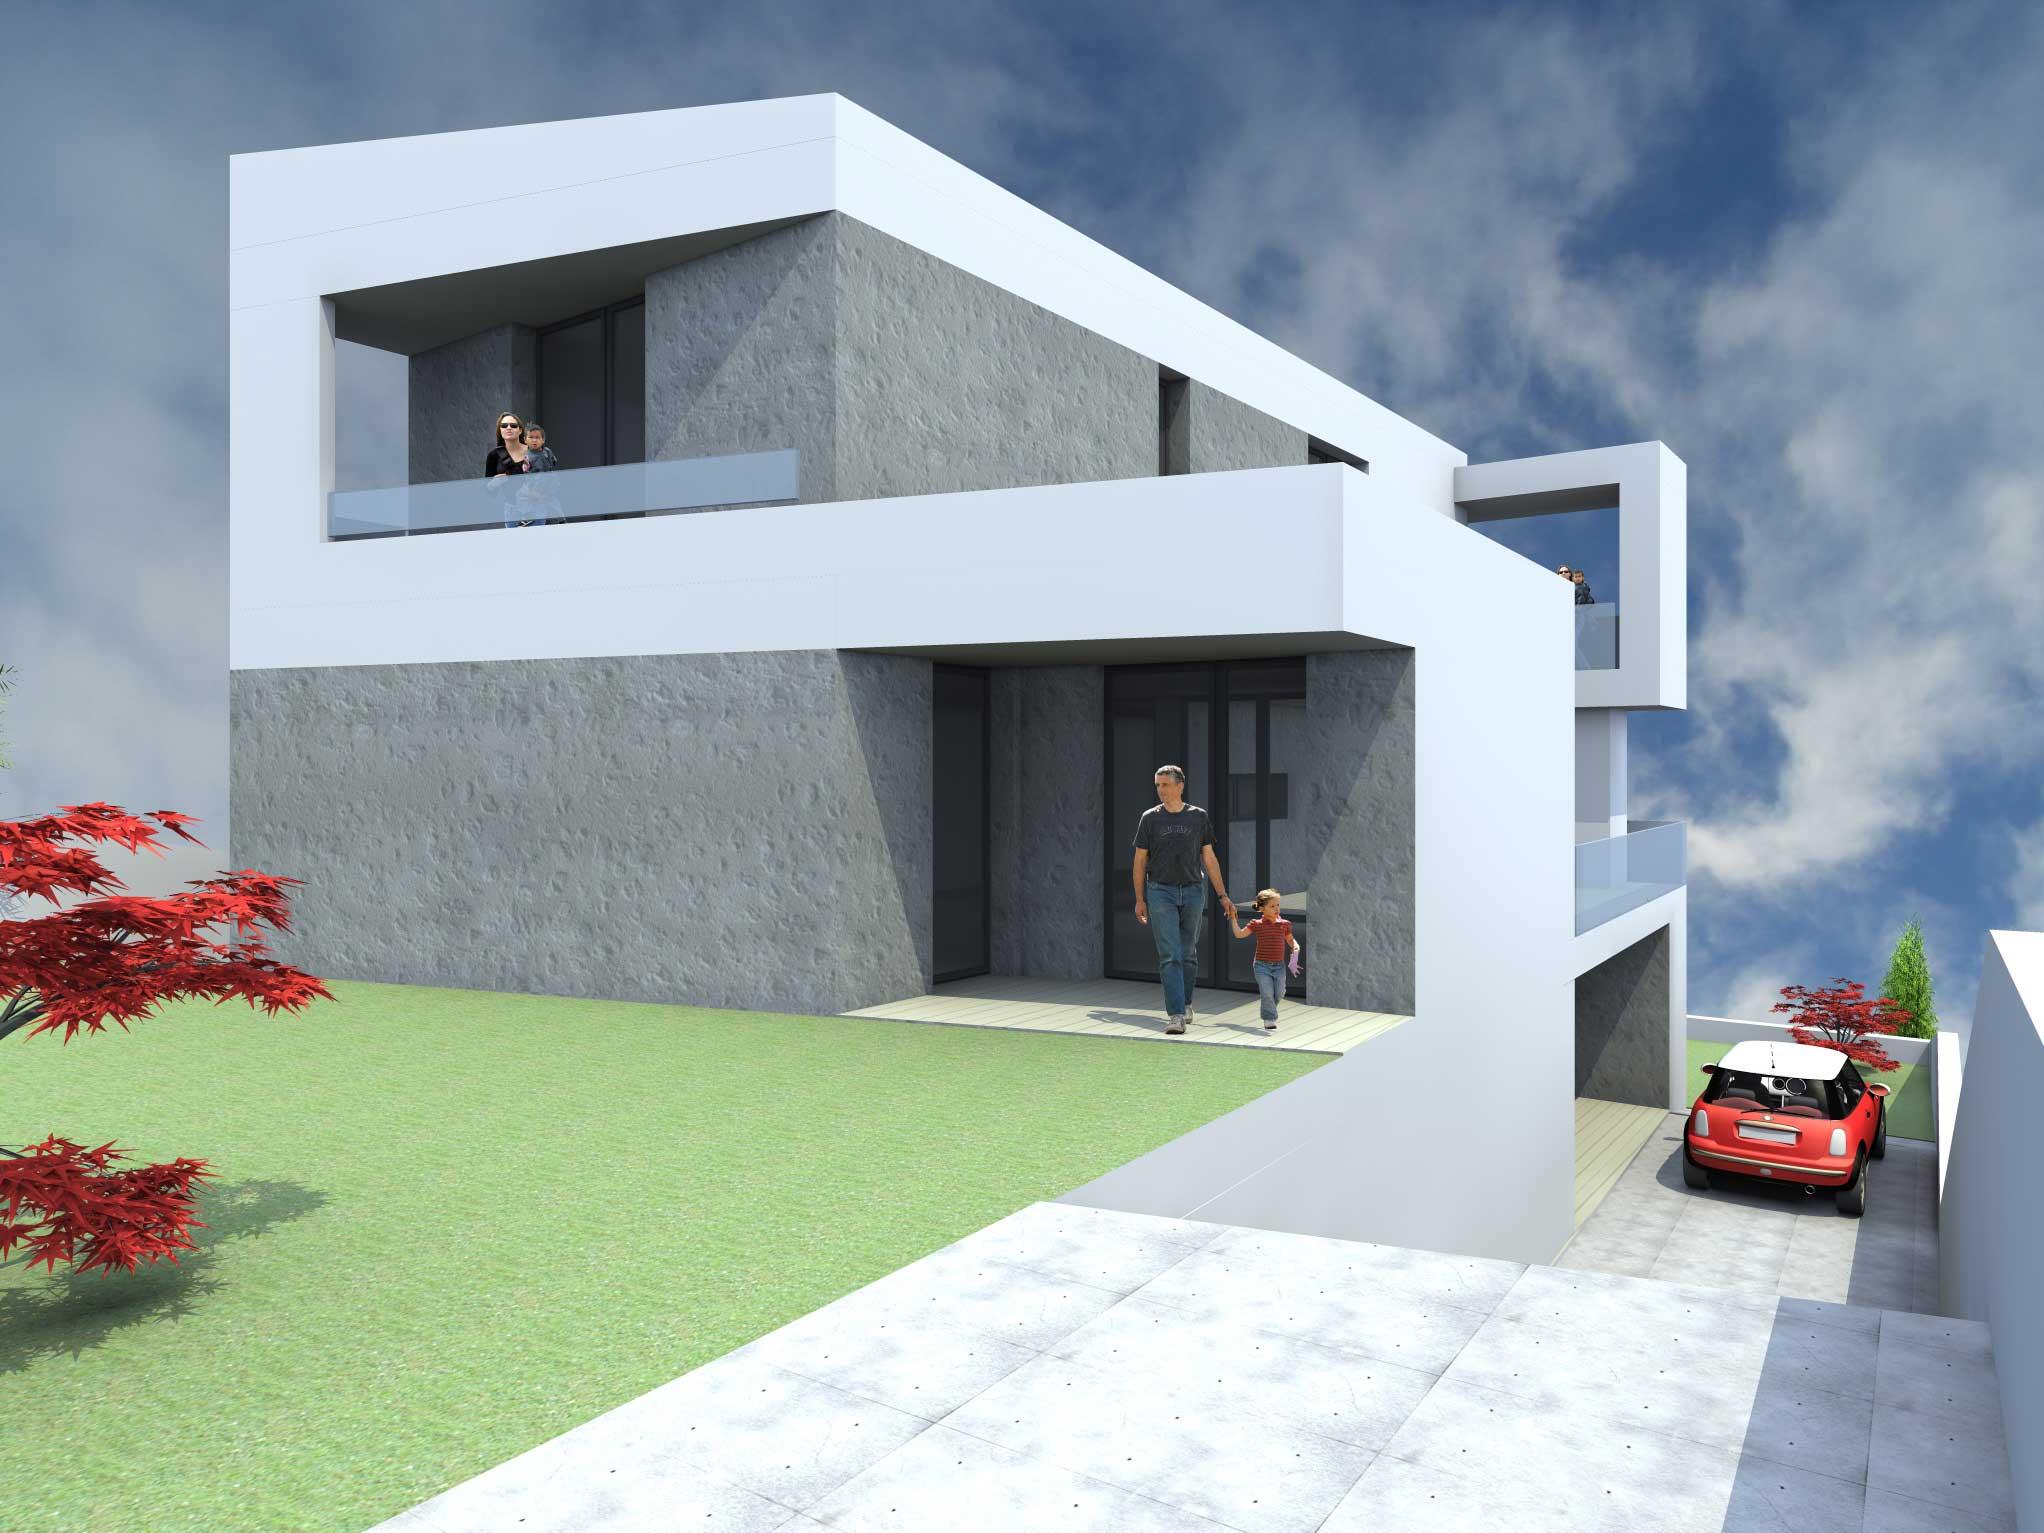 Moradia HFNC-render3